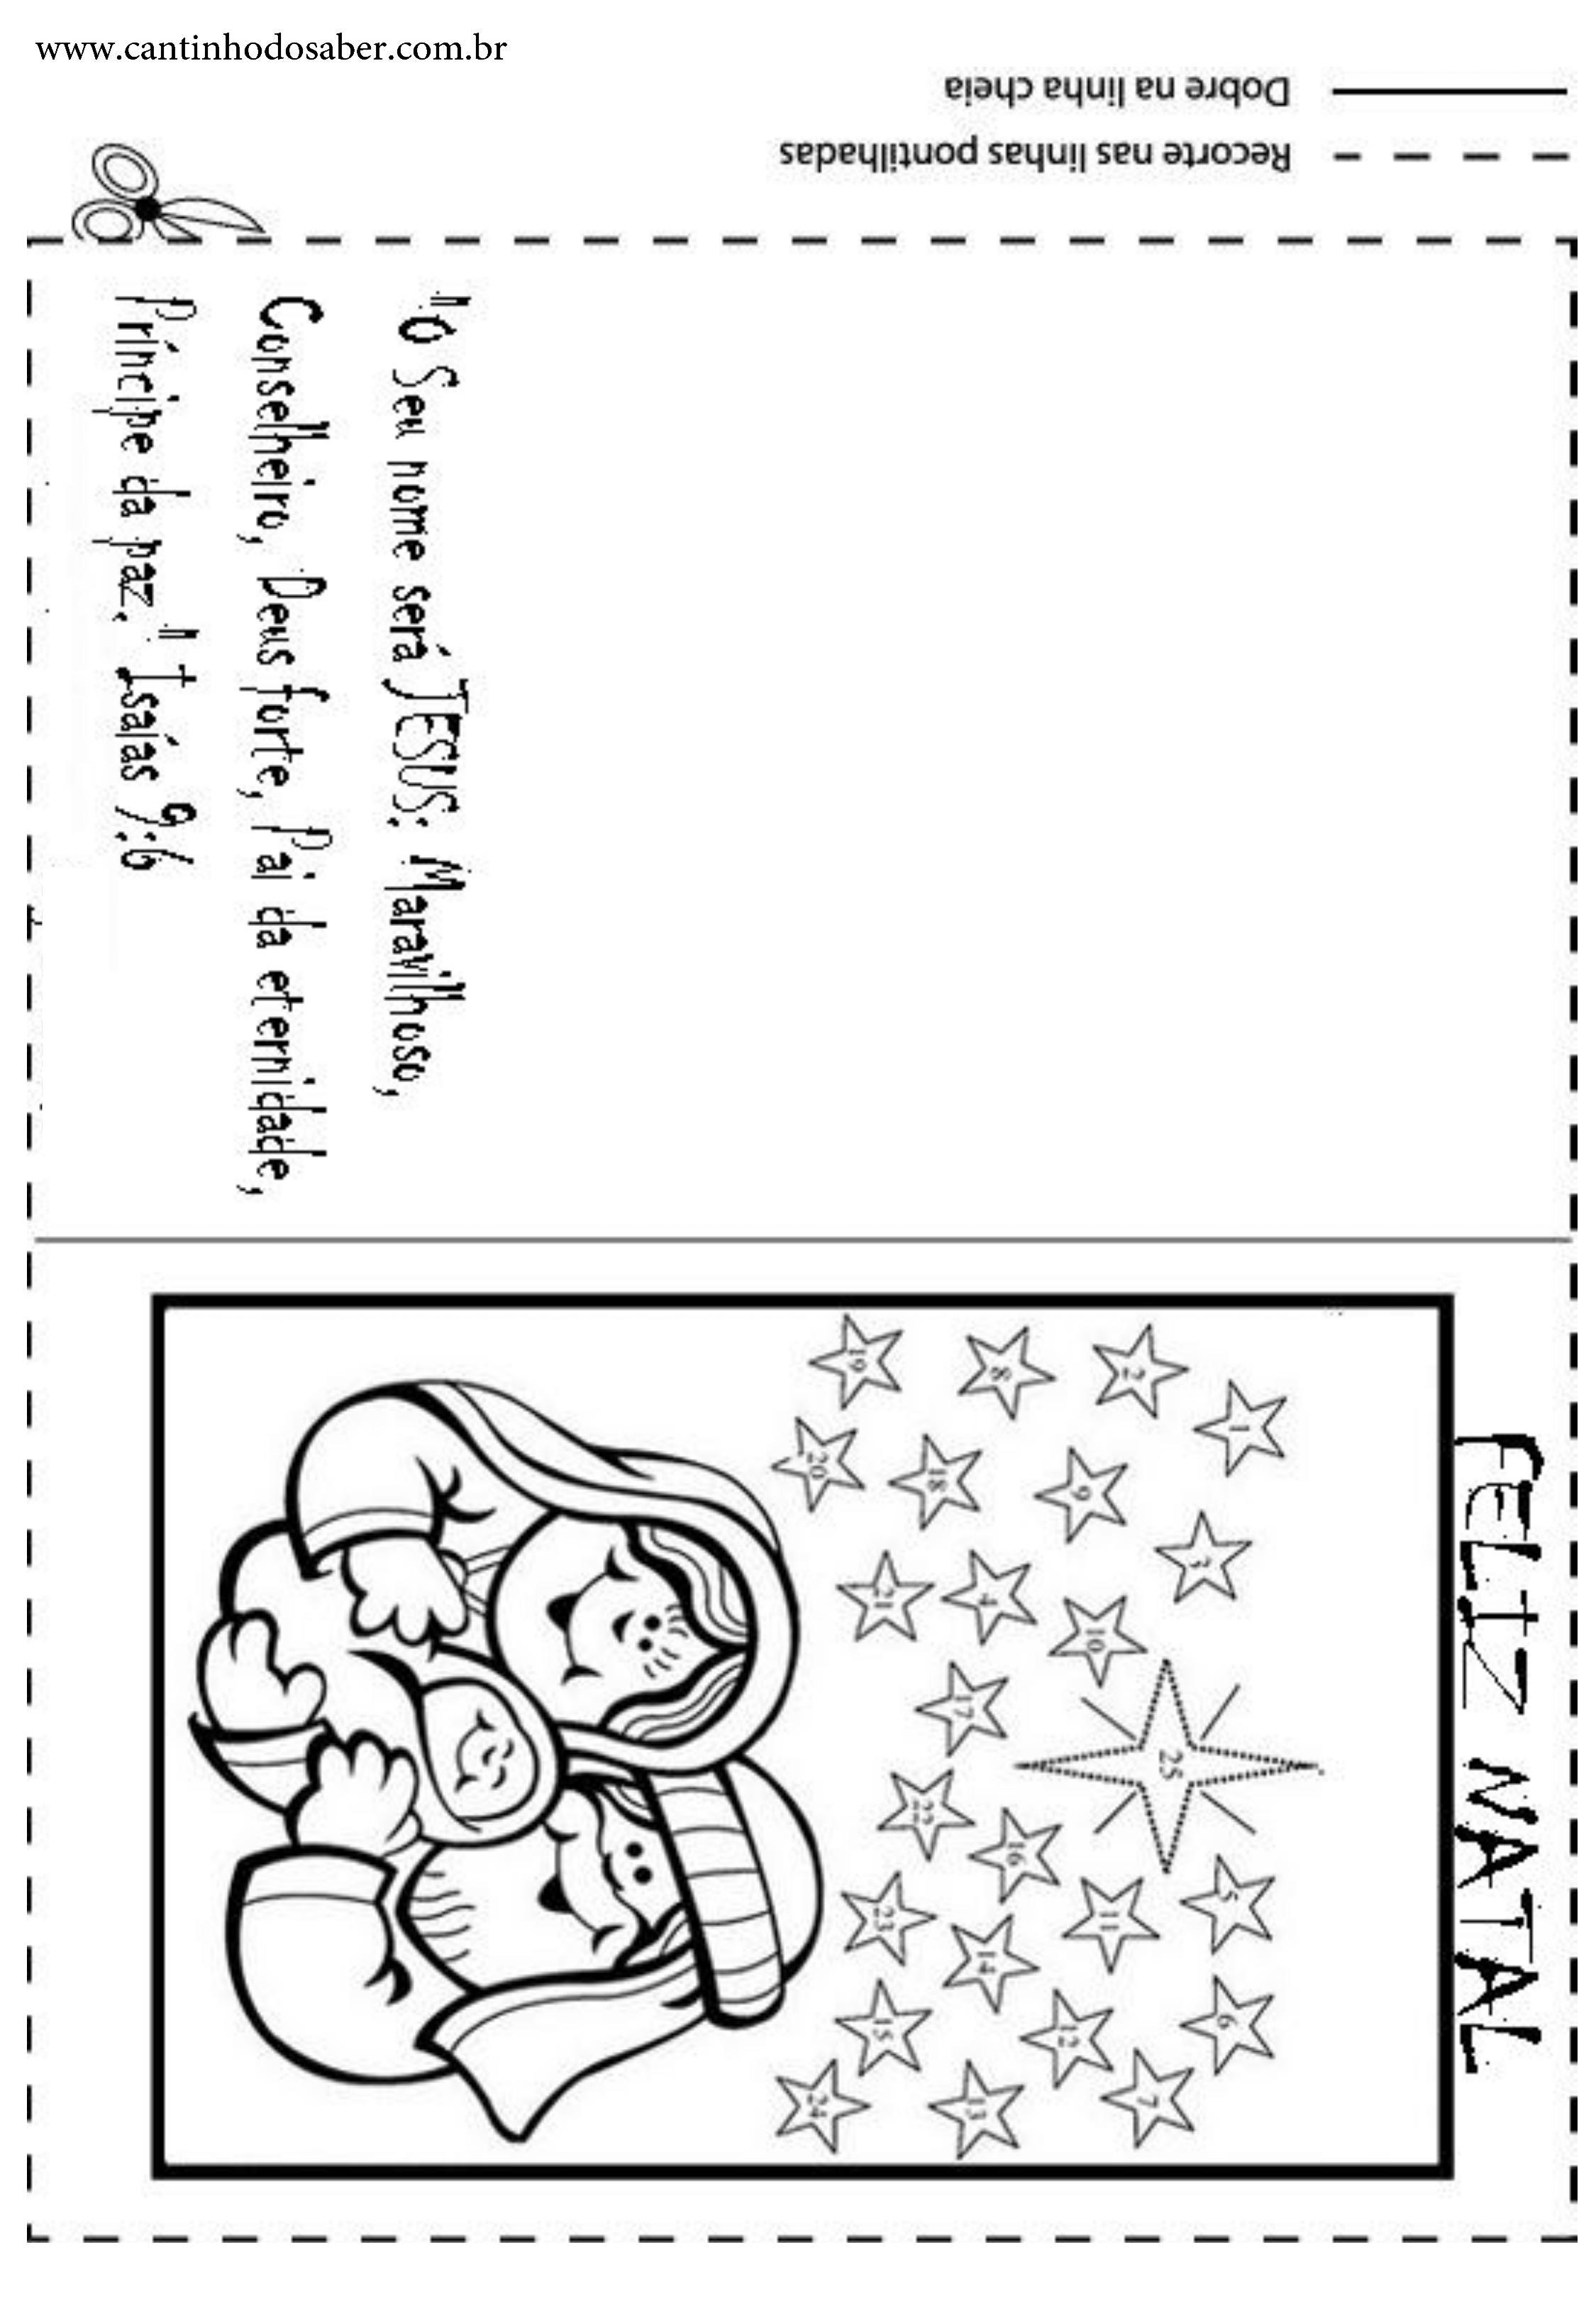 Cartoes De Natal Para Imprimir E Colorir